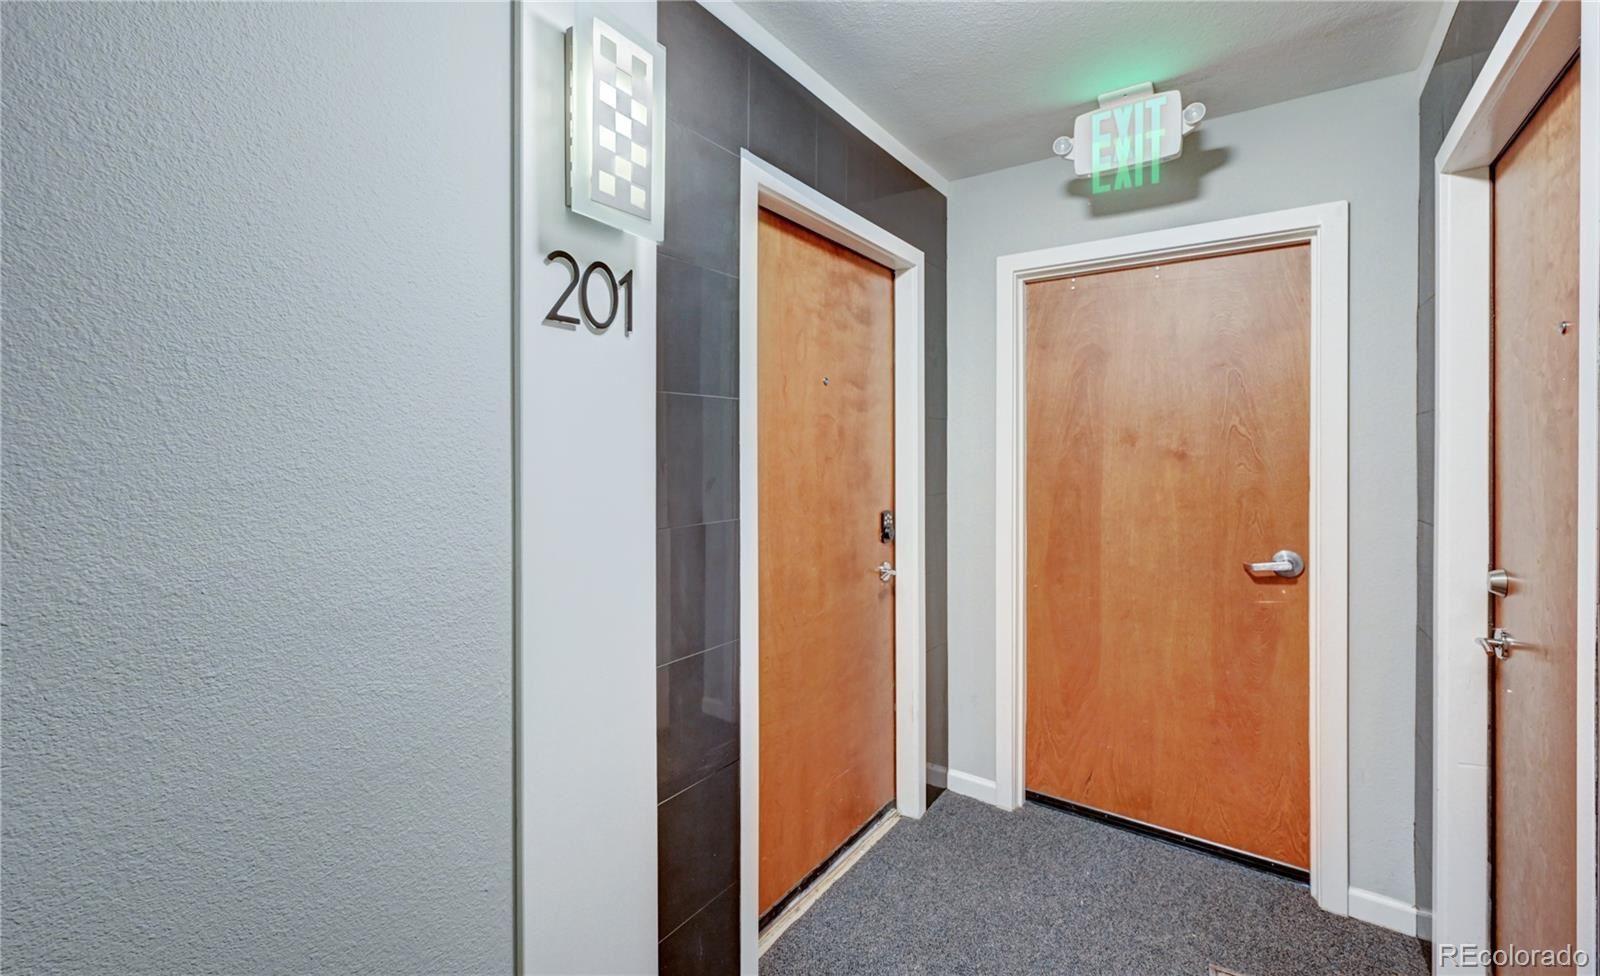 Photo of 1231 N Downing Street #201, Denver, CO 80218 (MLS # 8190570)